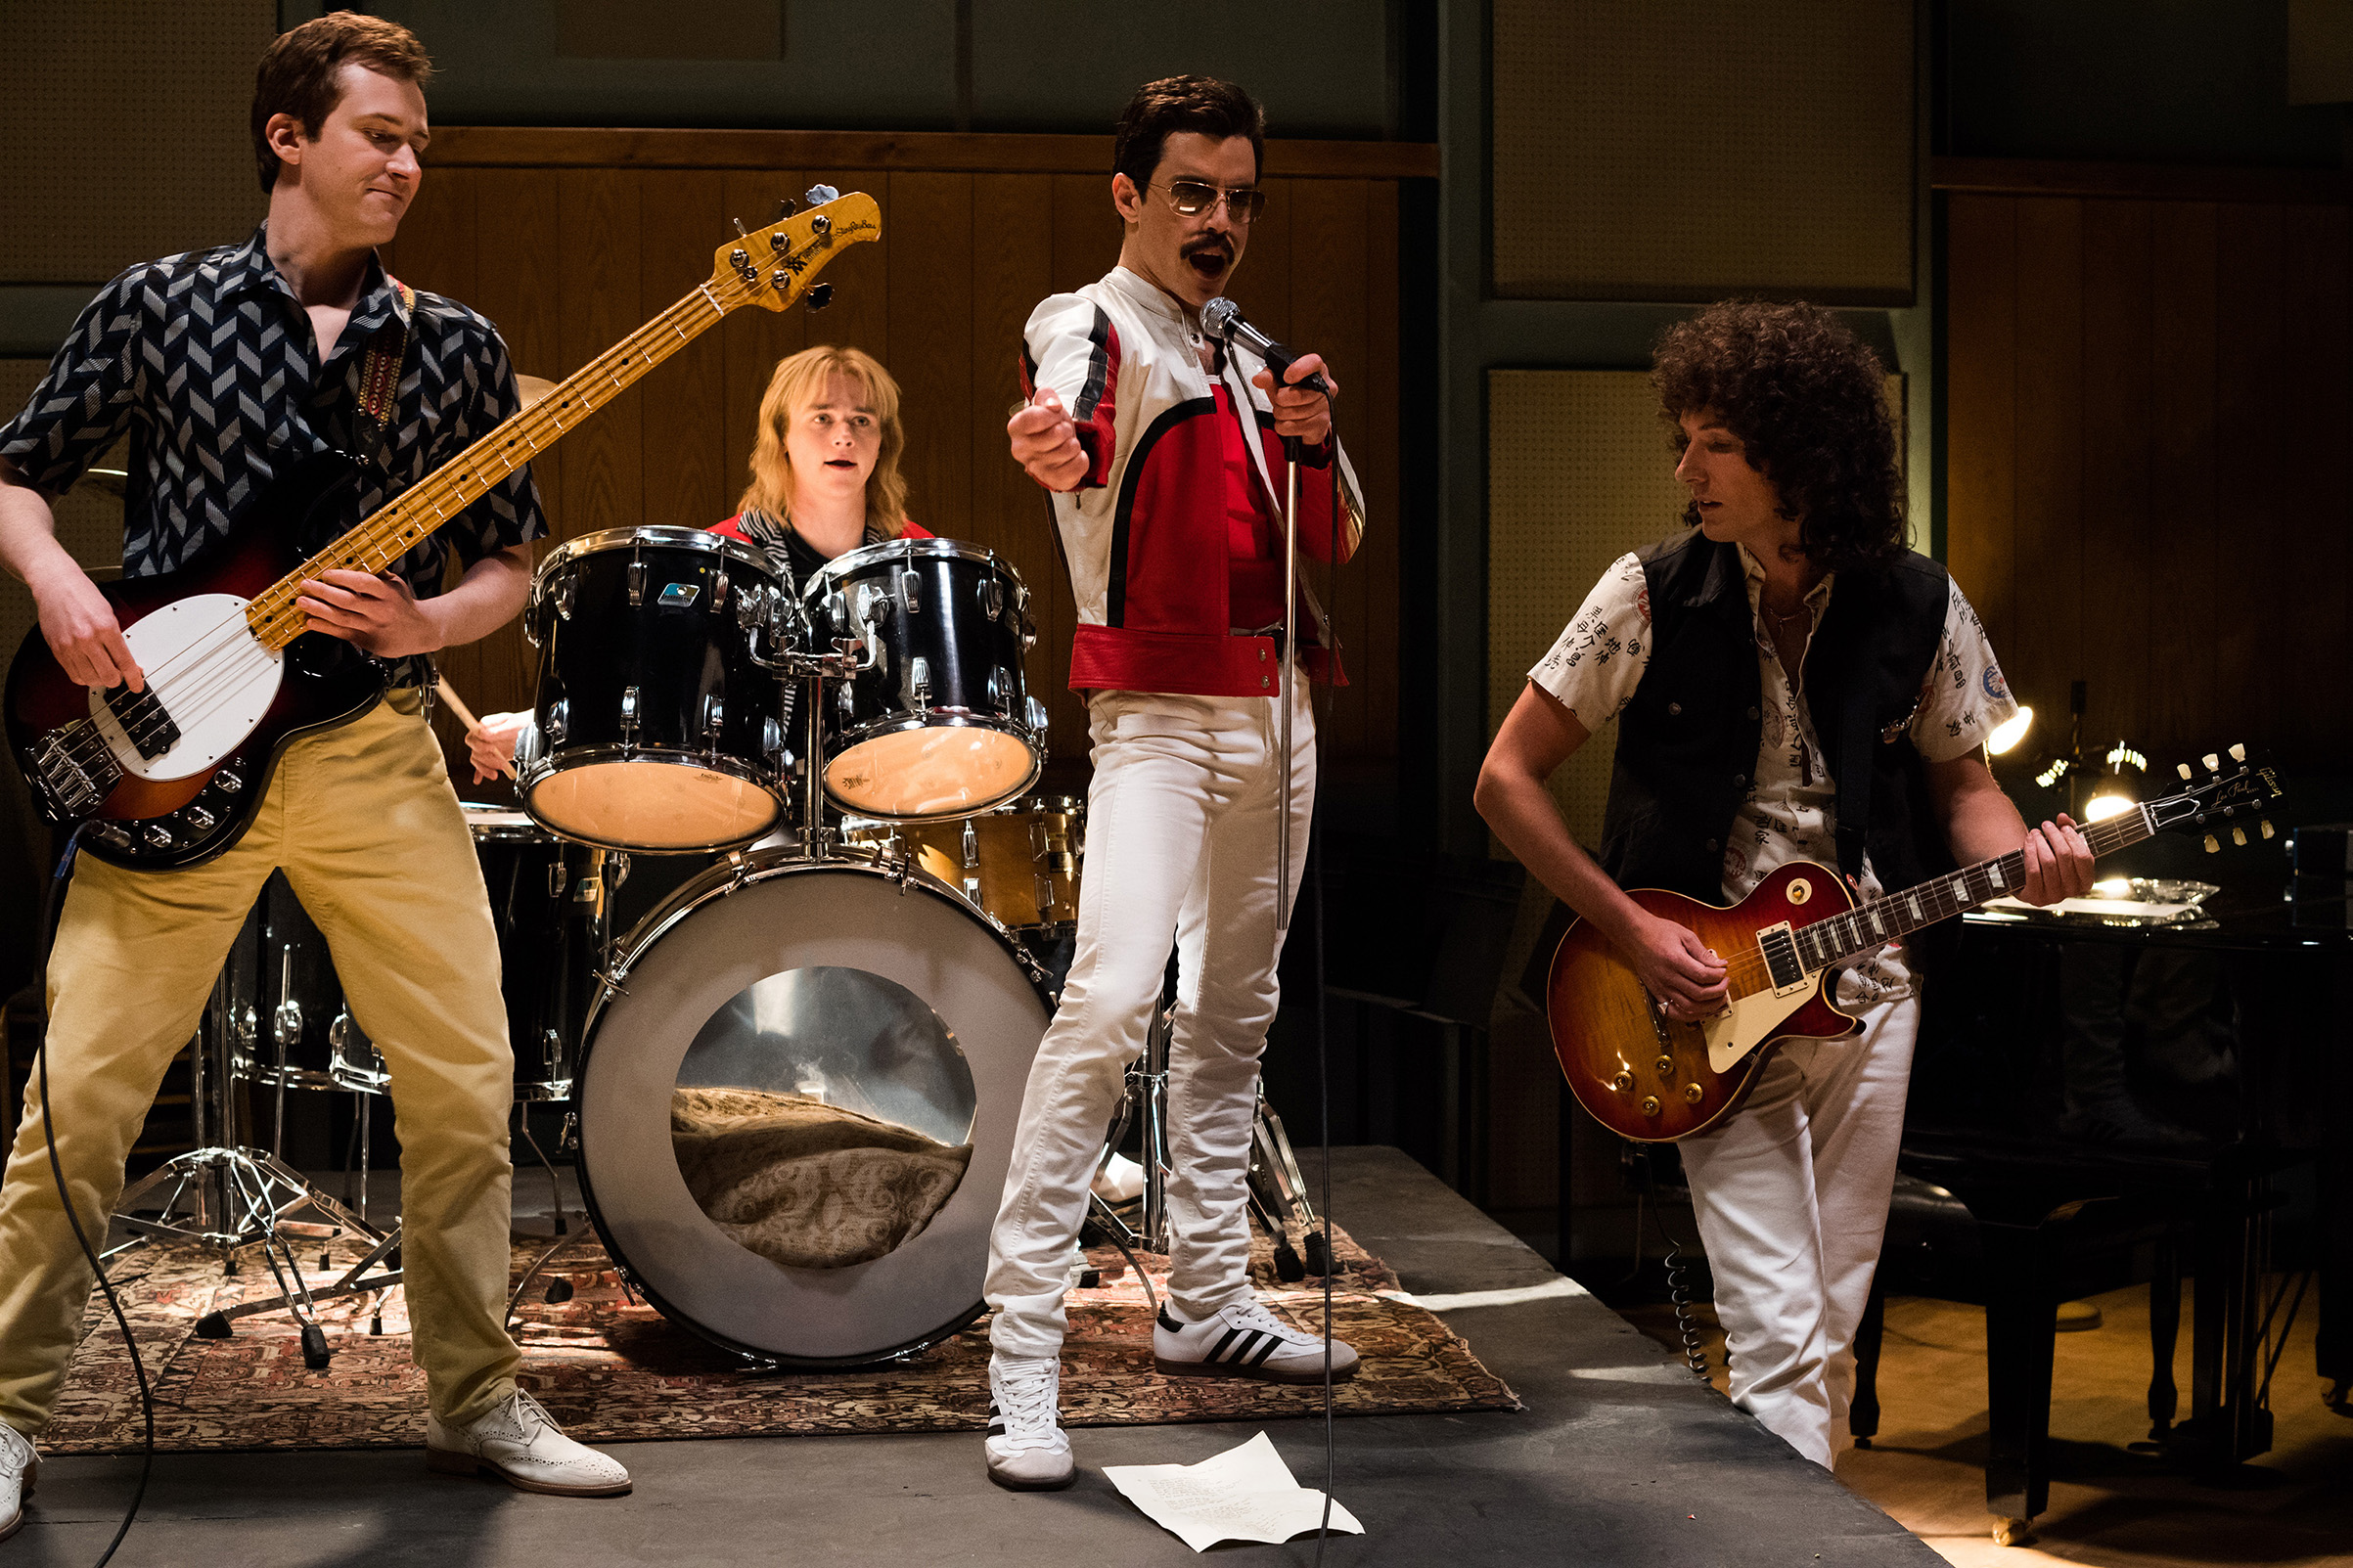 L-R: Joe Mazzello (John Deacon), Ben Hardy (Roger Taylor), Rami Malek (Freddie Mercury), and Gwilym Lee (Brian May) star in Twentieth Century Fox's Bohemian Rhapsody